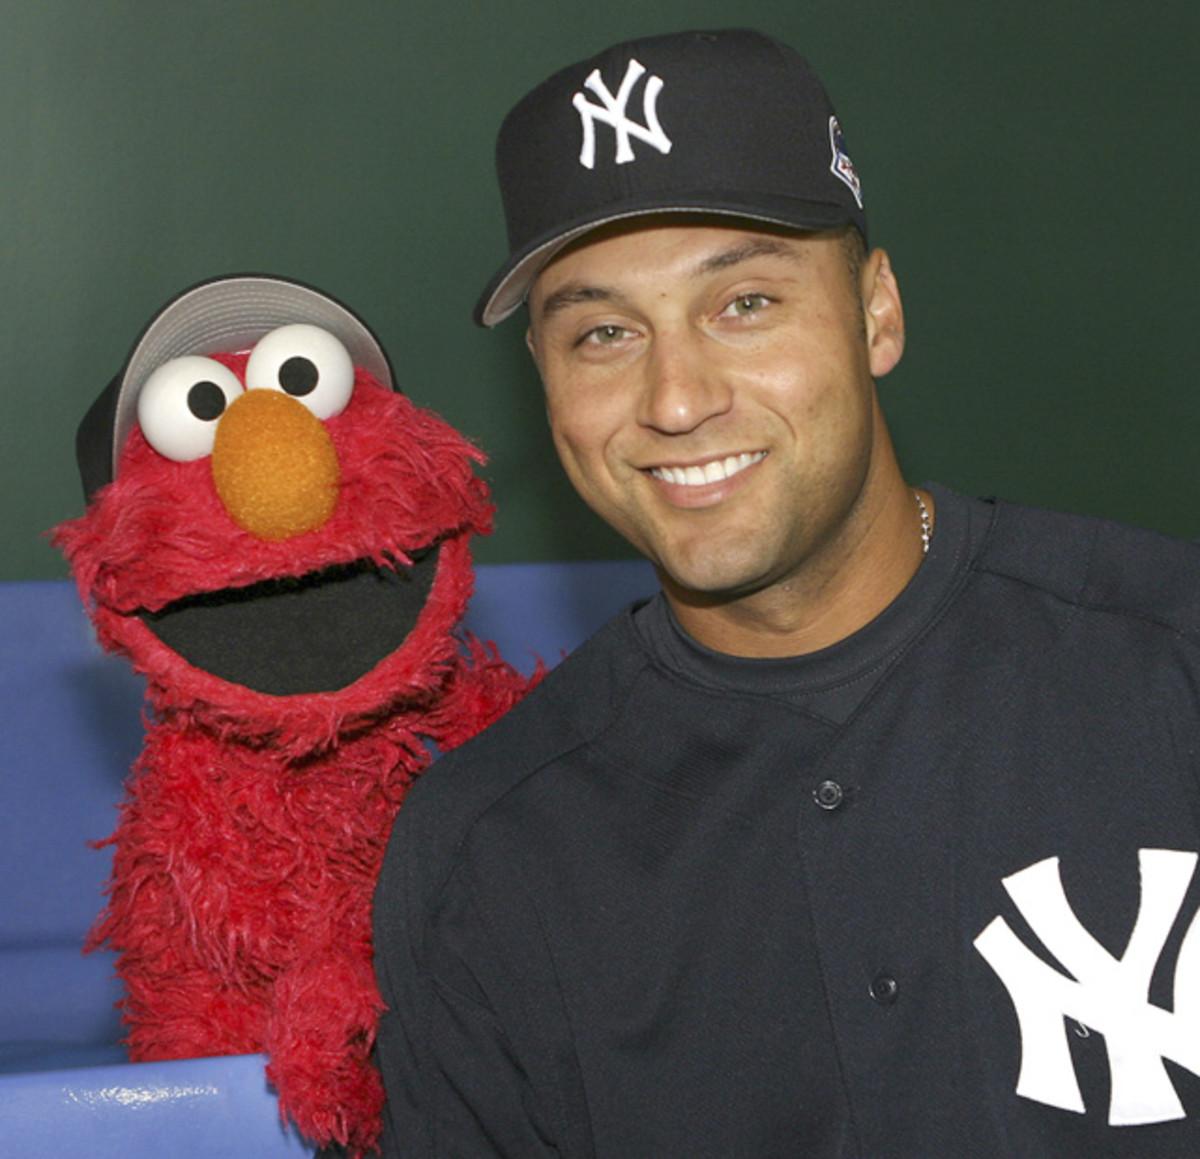 Derek Jeter and Elmo